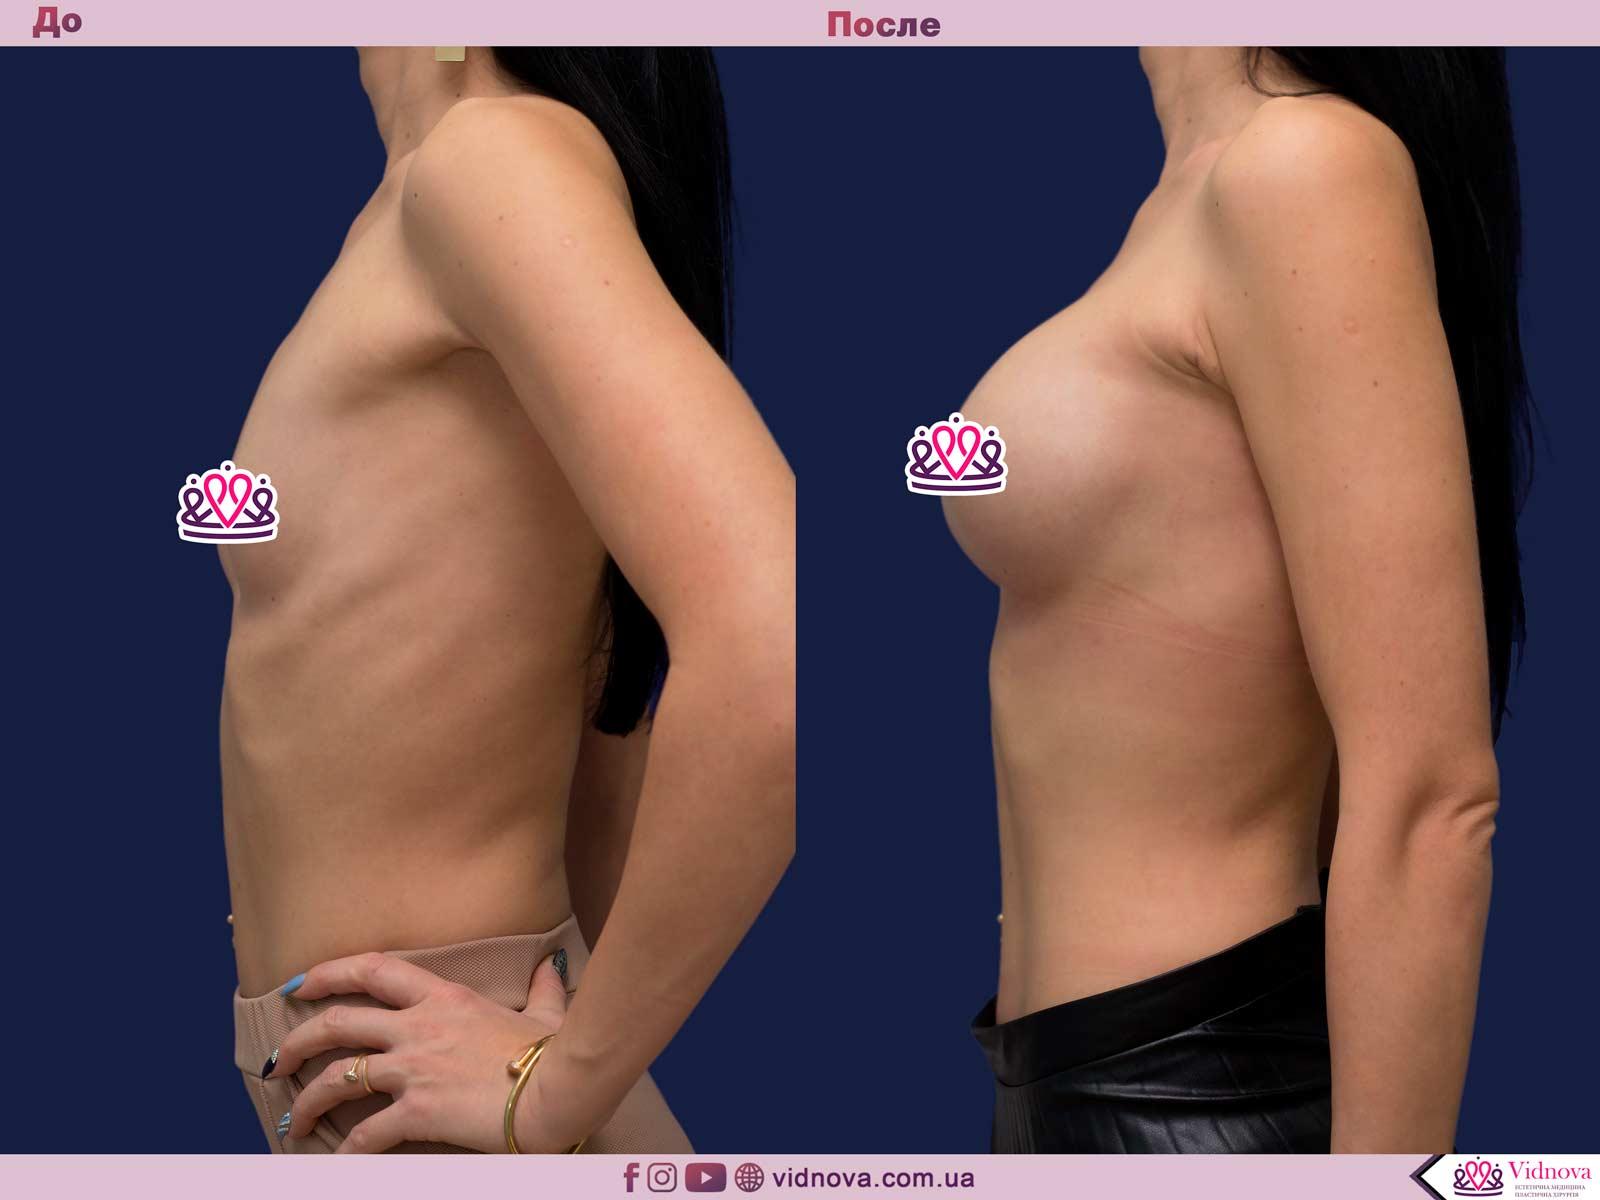 Увеличение груди: Фото ДО и ПОСЛЕ - Пример №80-3 - Клиника Vidnova